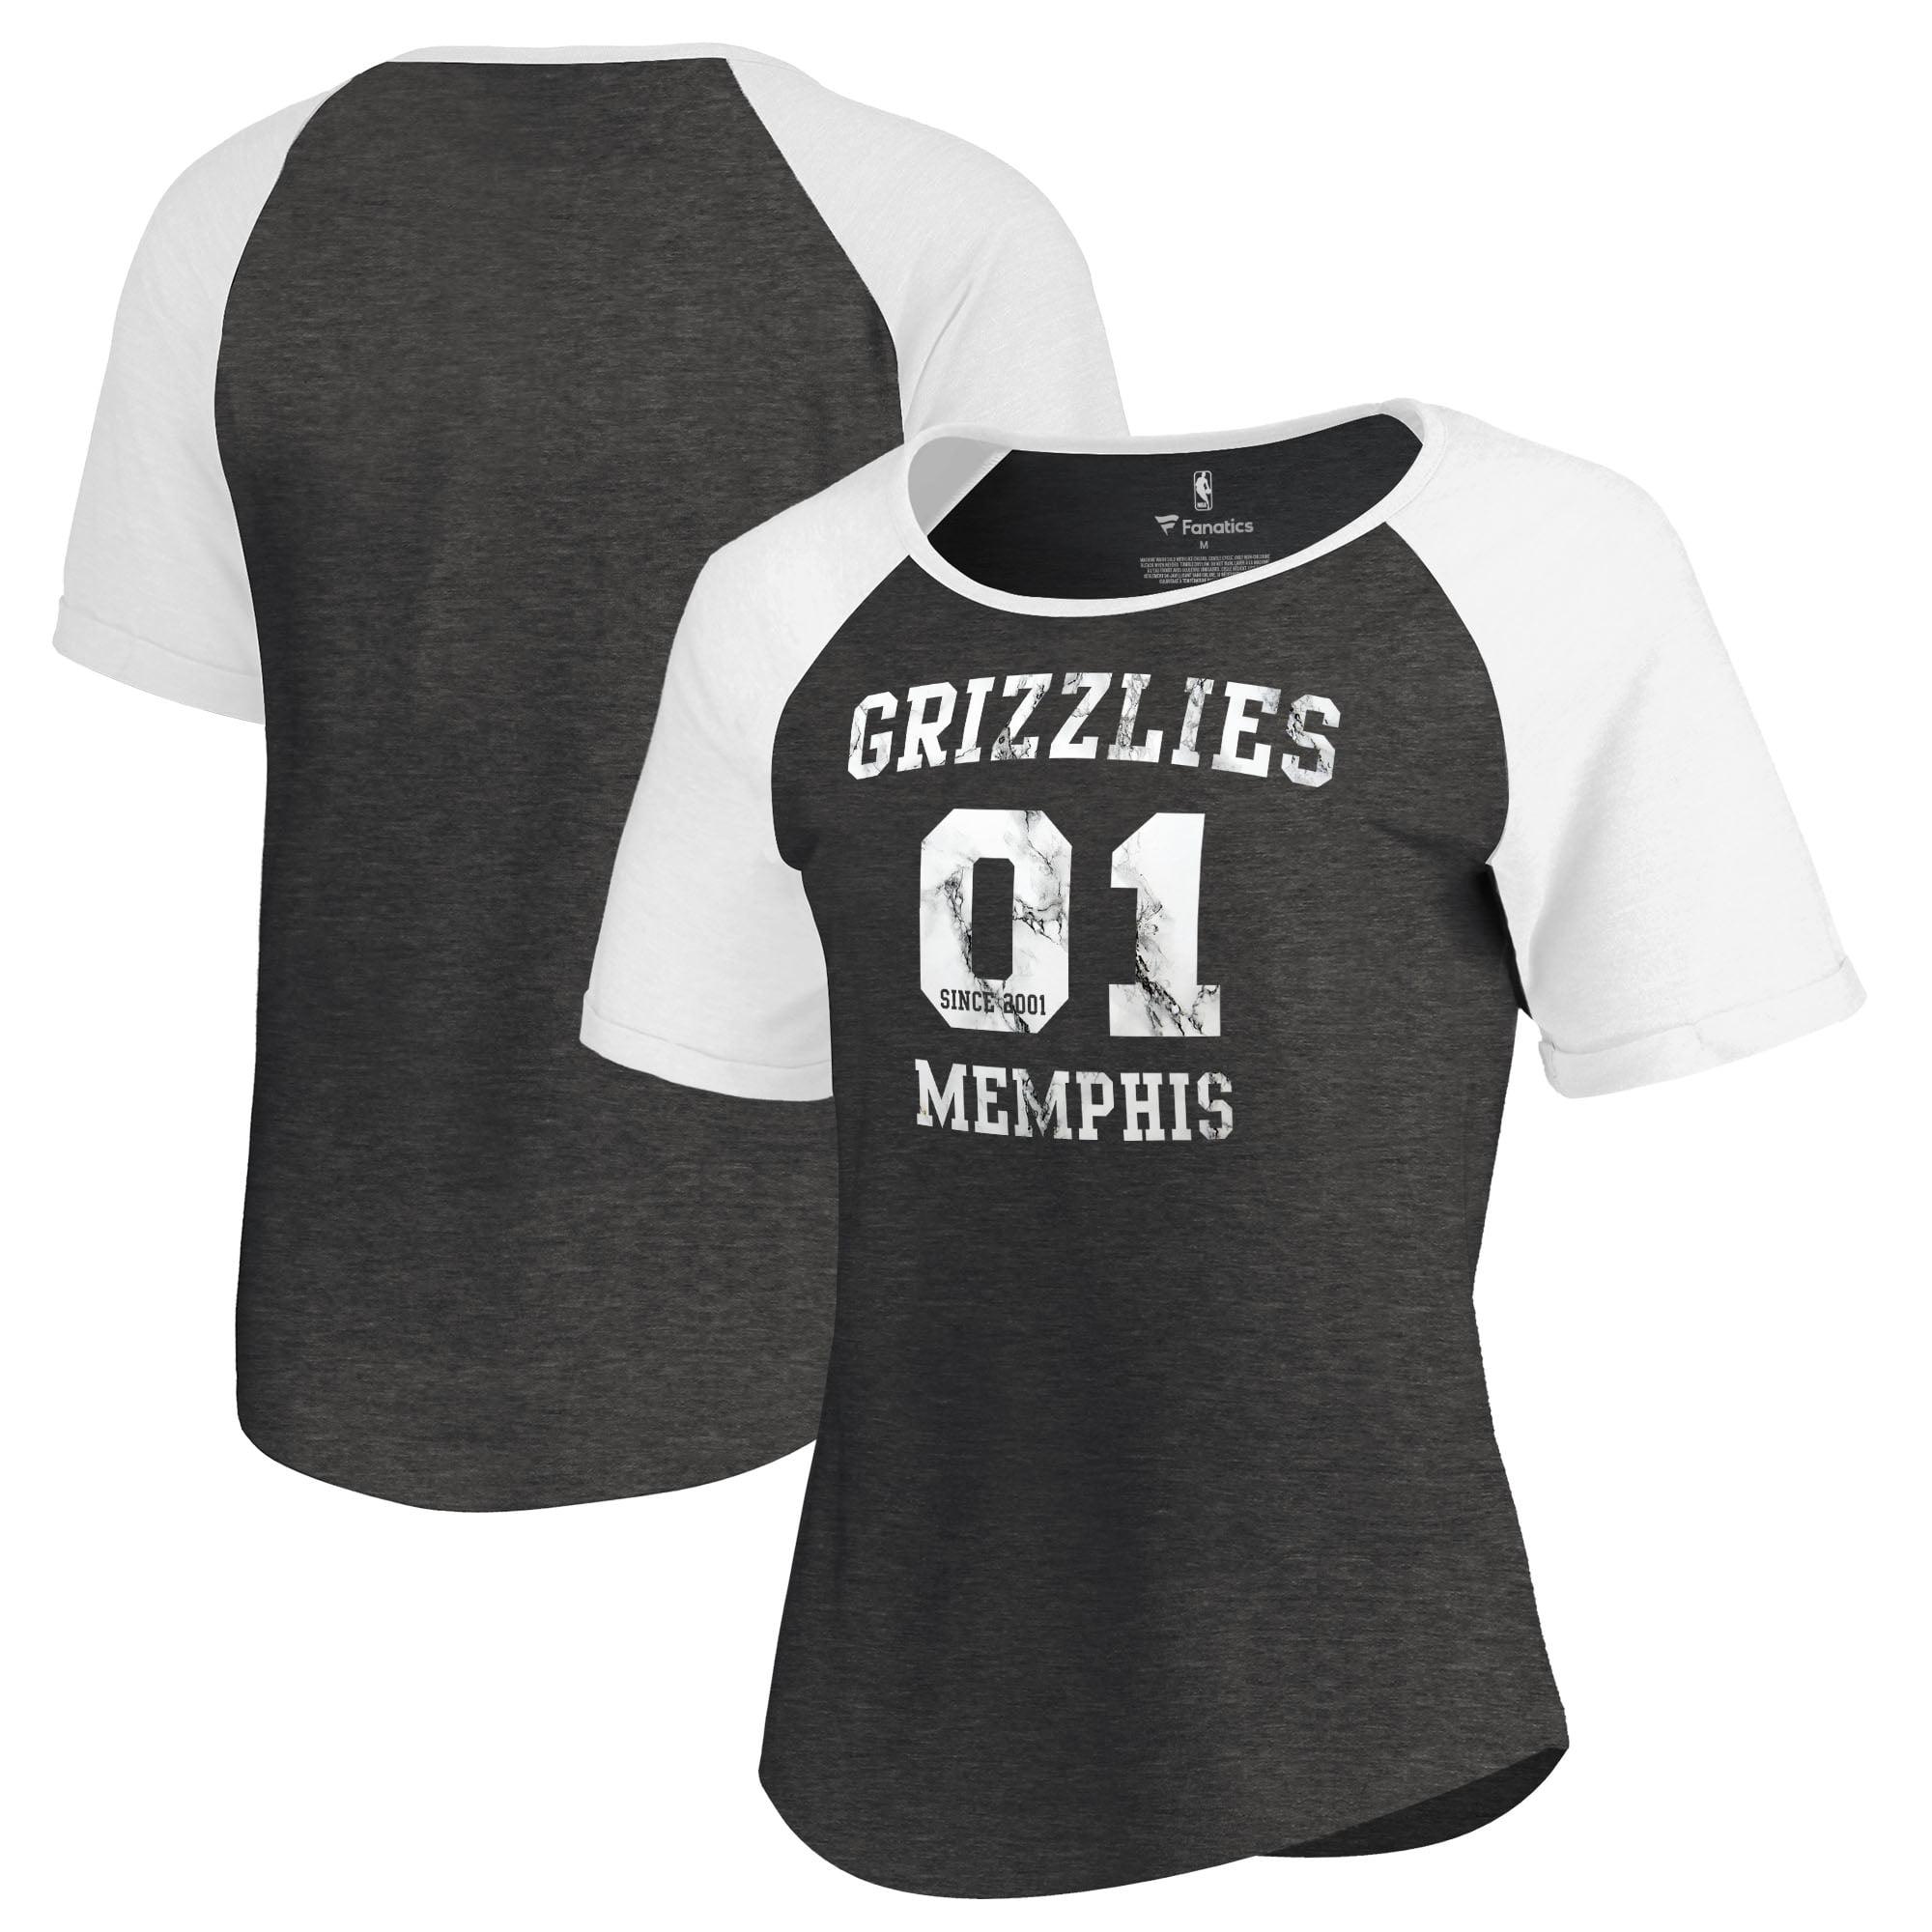 Memphis Grizzlies Fanatics Branded Women's Hang Time Short Sleeve Raglan T-Shirt - Black